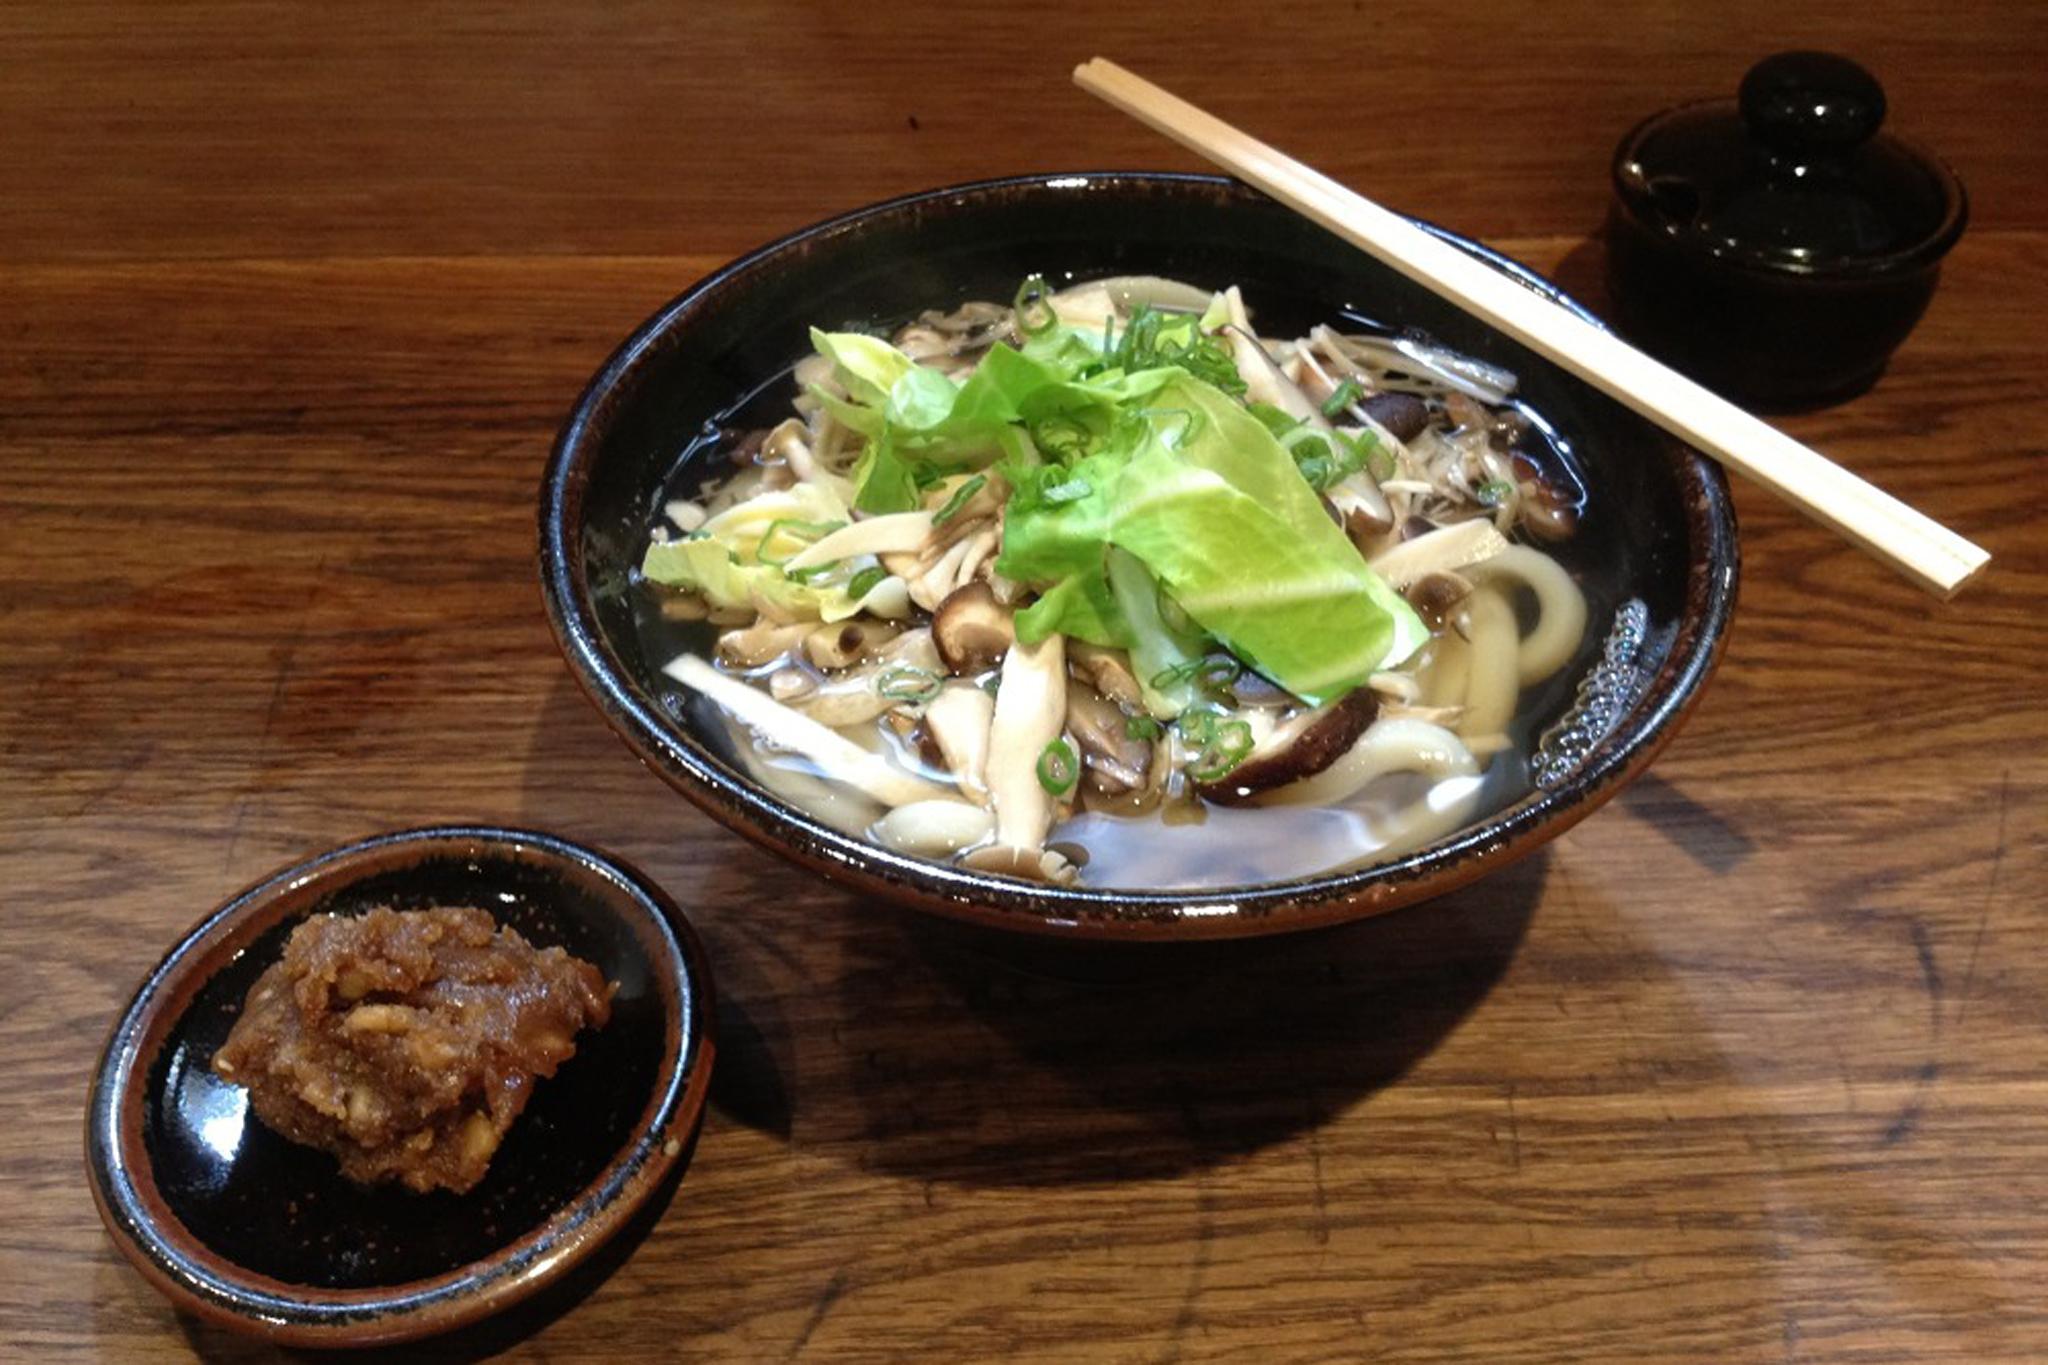 Walnut miso udon at Koya